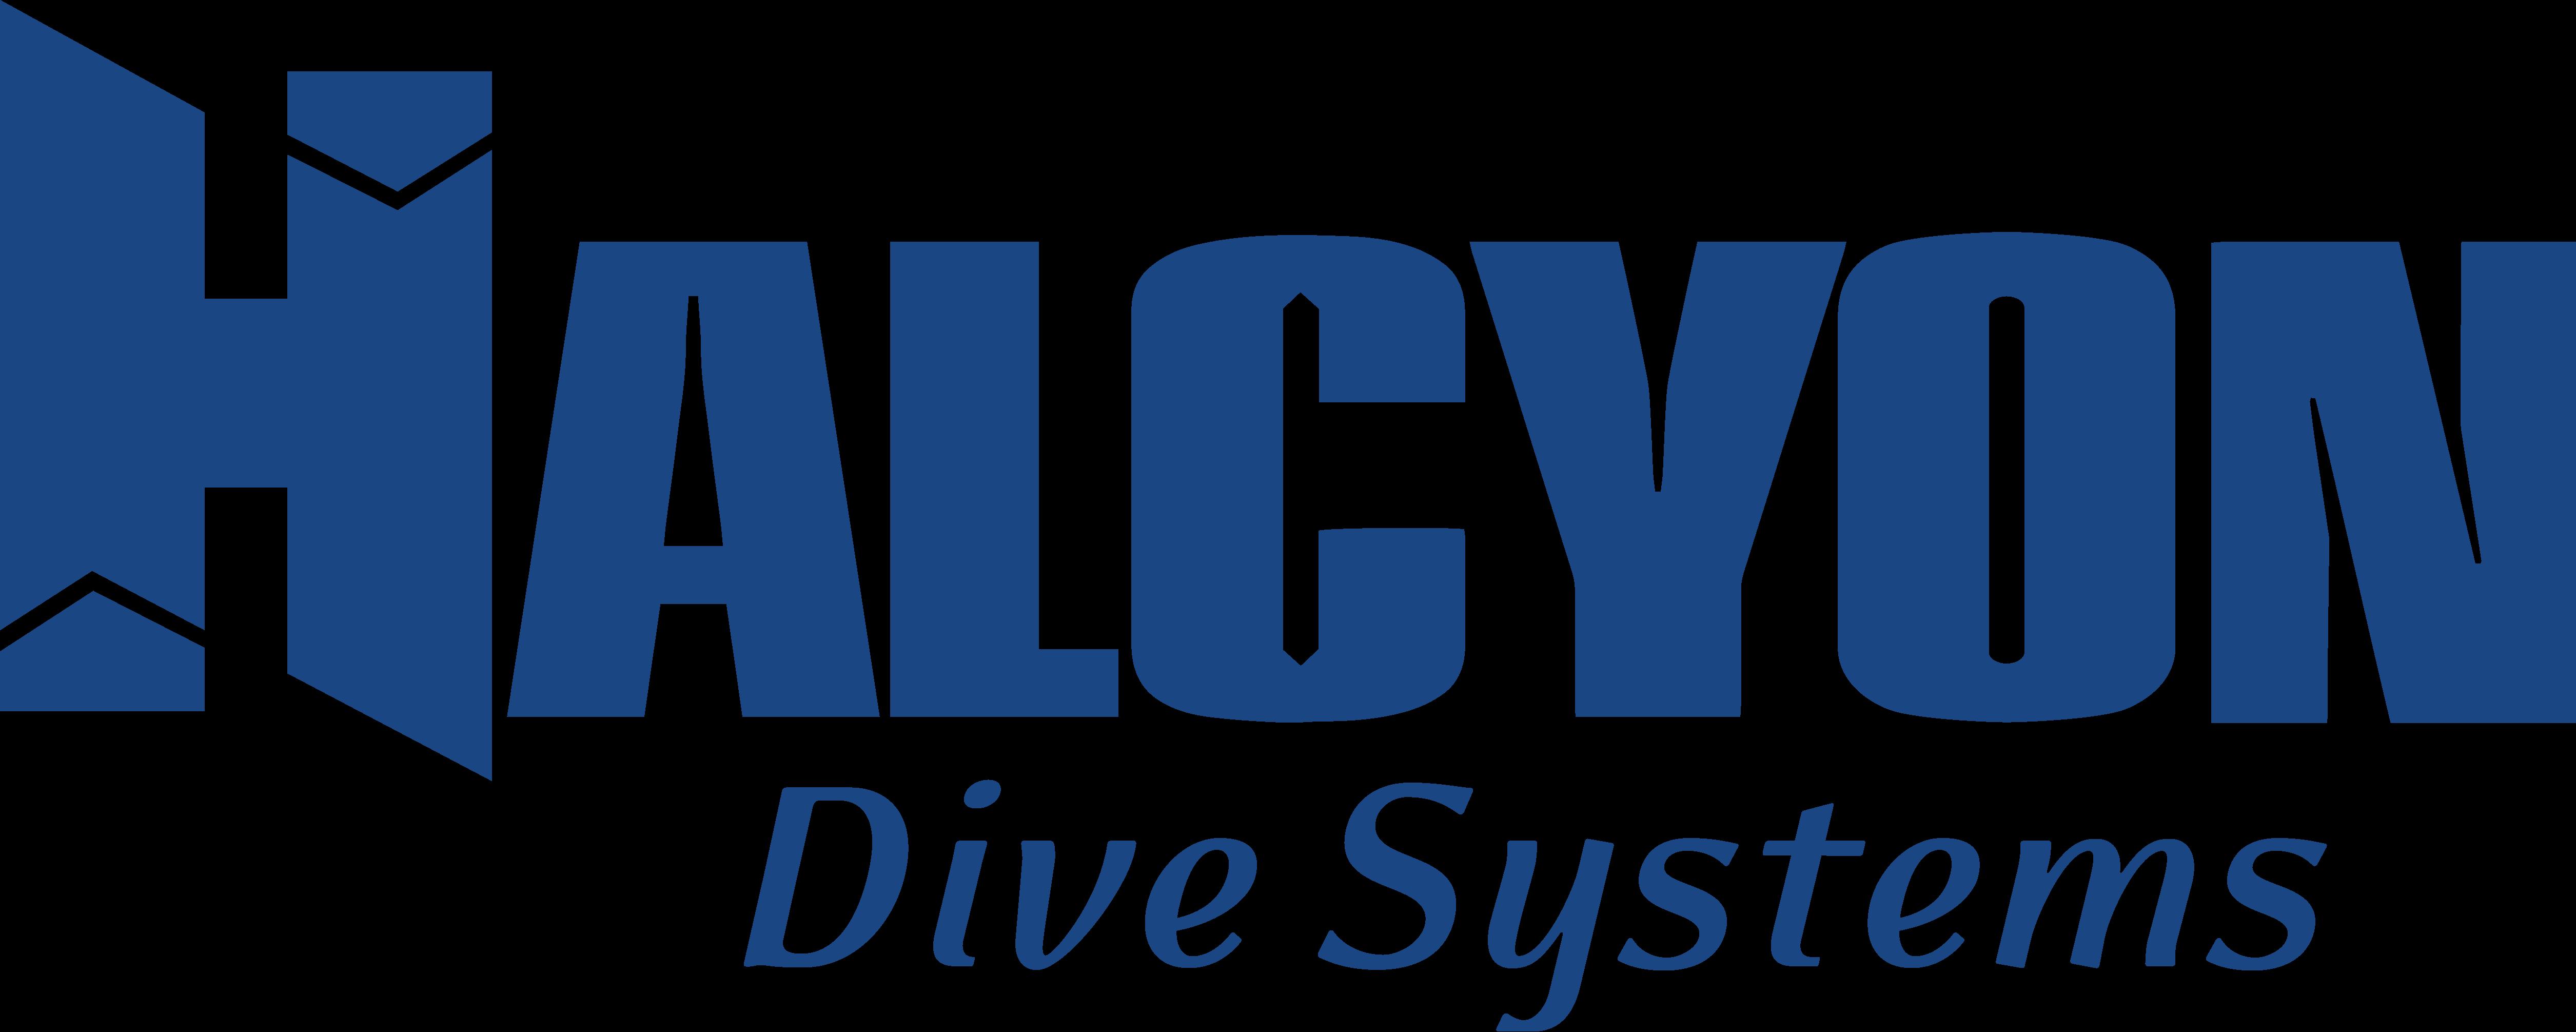 Halcyon dive systems logo